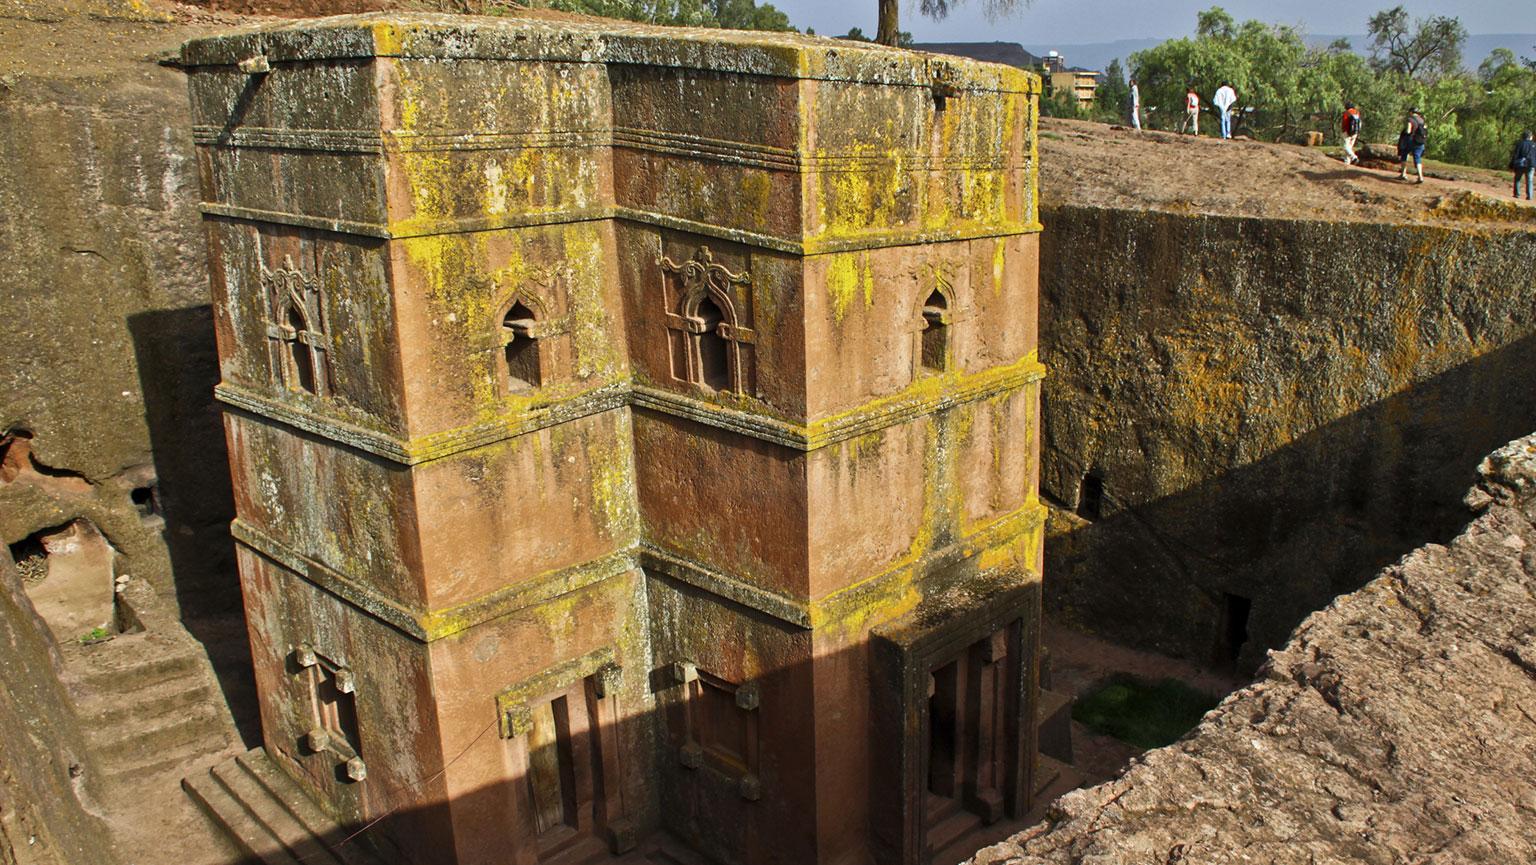 The Rock-Hewn Churches of Ethiopia